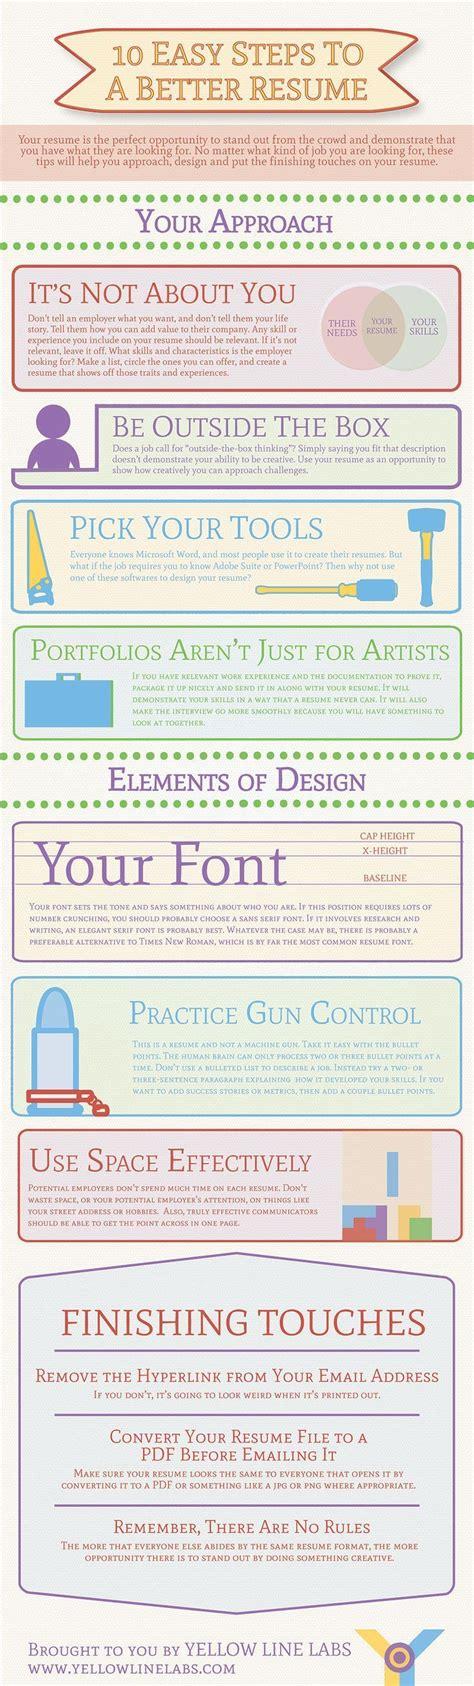 25 unique resume writing tips ideas on pinterest resume writing